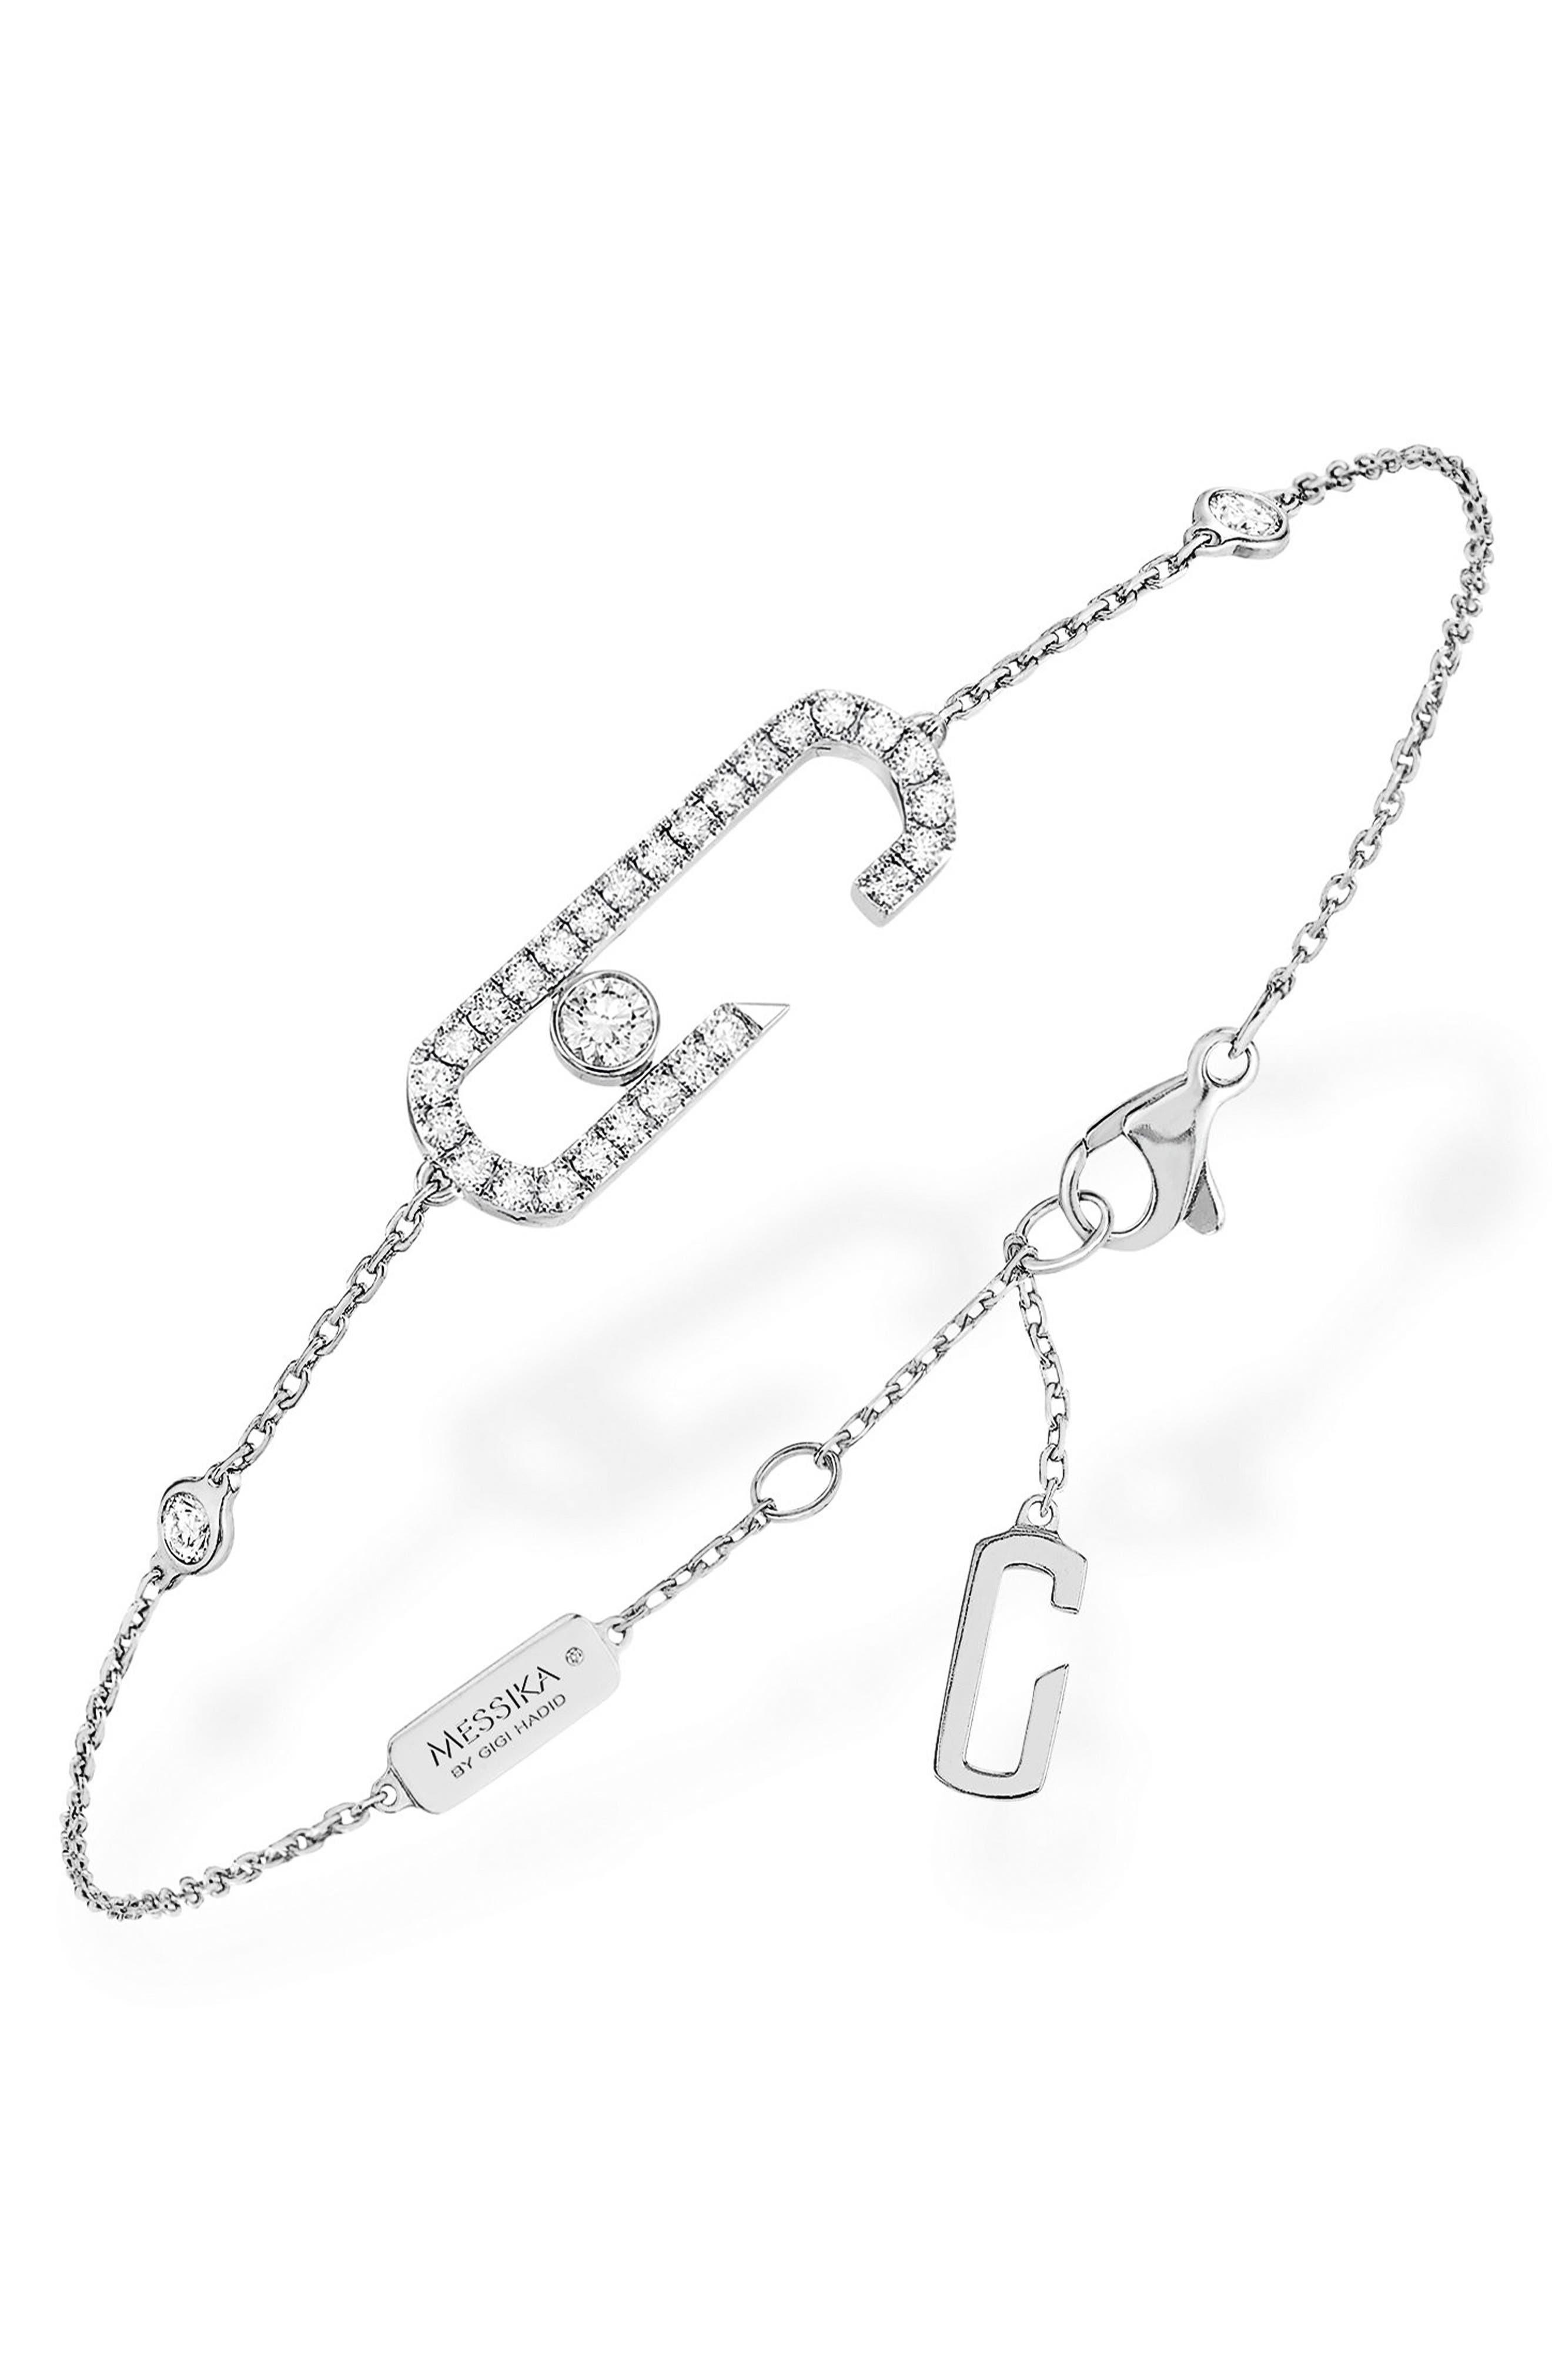 Move Addiction by Gigi Hadid Diamond Pavé Line Bracelet,                         Main,                         color, WHITE GOLD